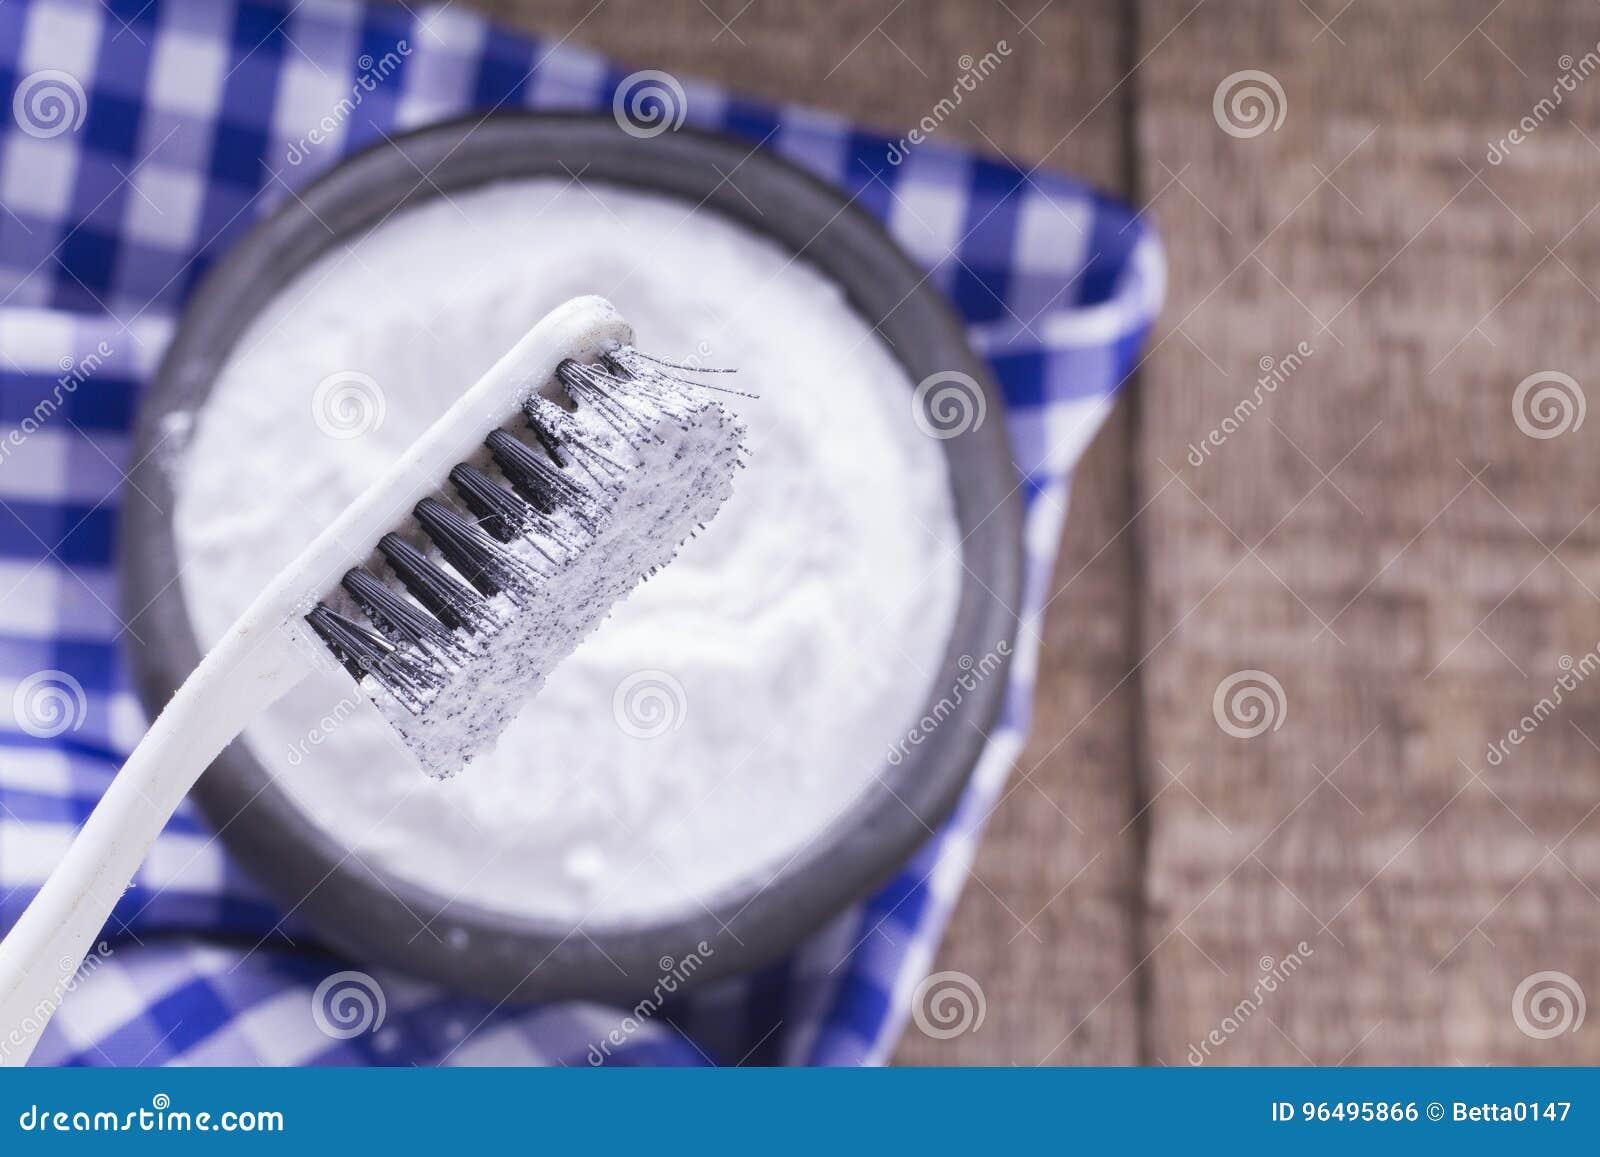 Bicarbonate de soude et brosse